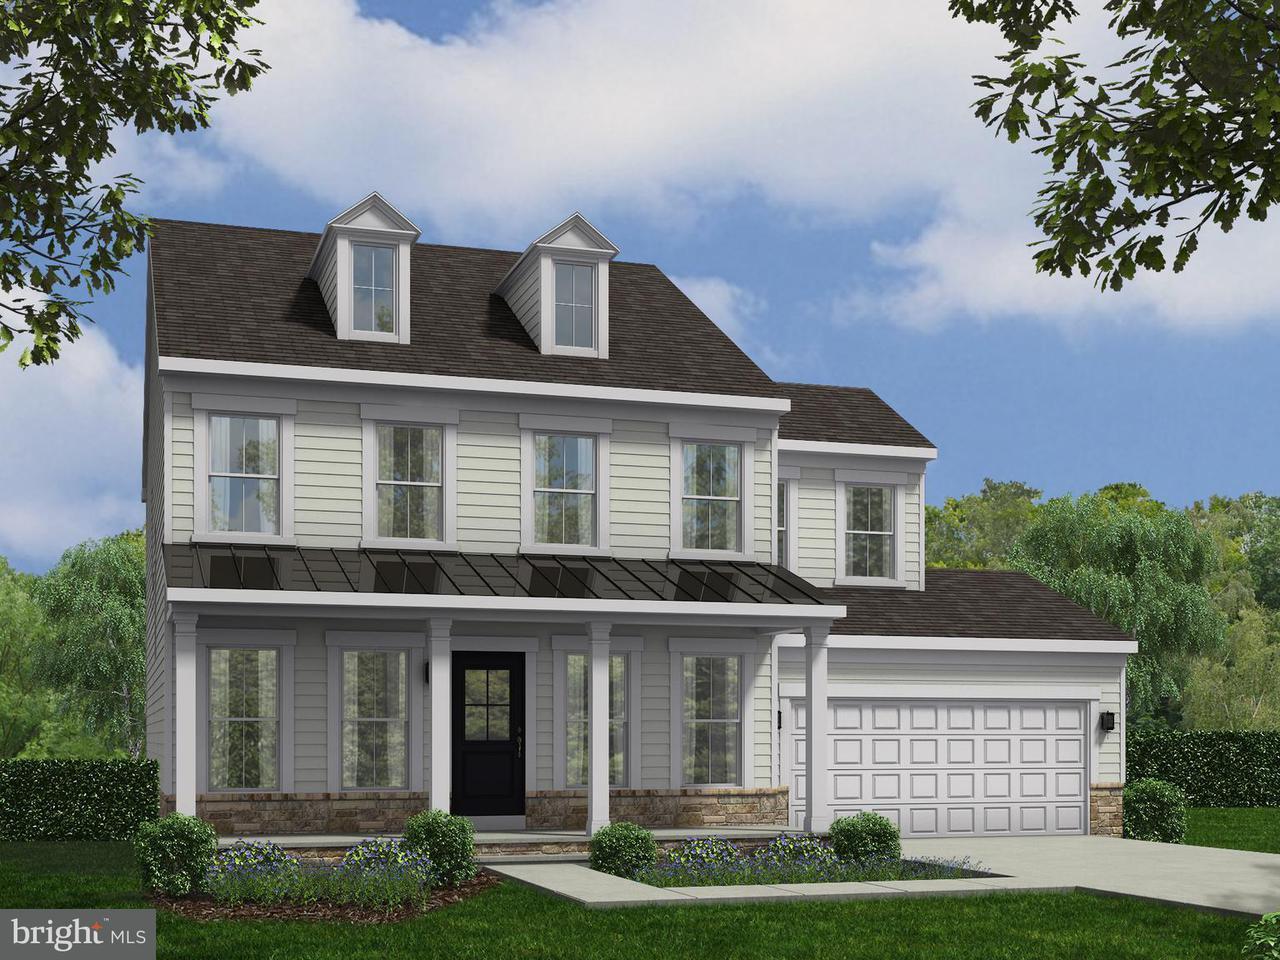 獨棟家庭住宅 為 出售 在 6540 JOUSTING Court 6540 JOUSTING Court Indian Head, 馬里蘭州 20640 美國